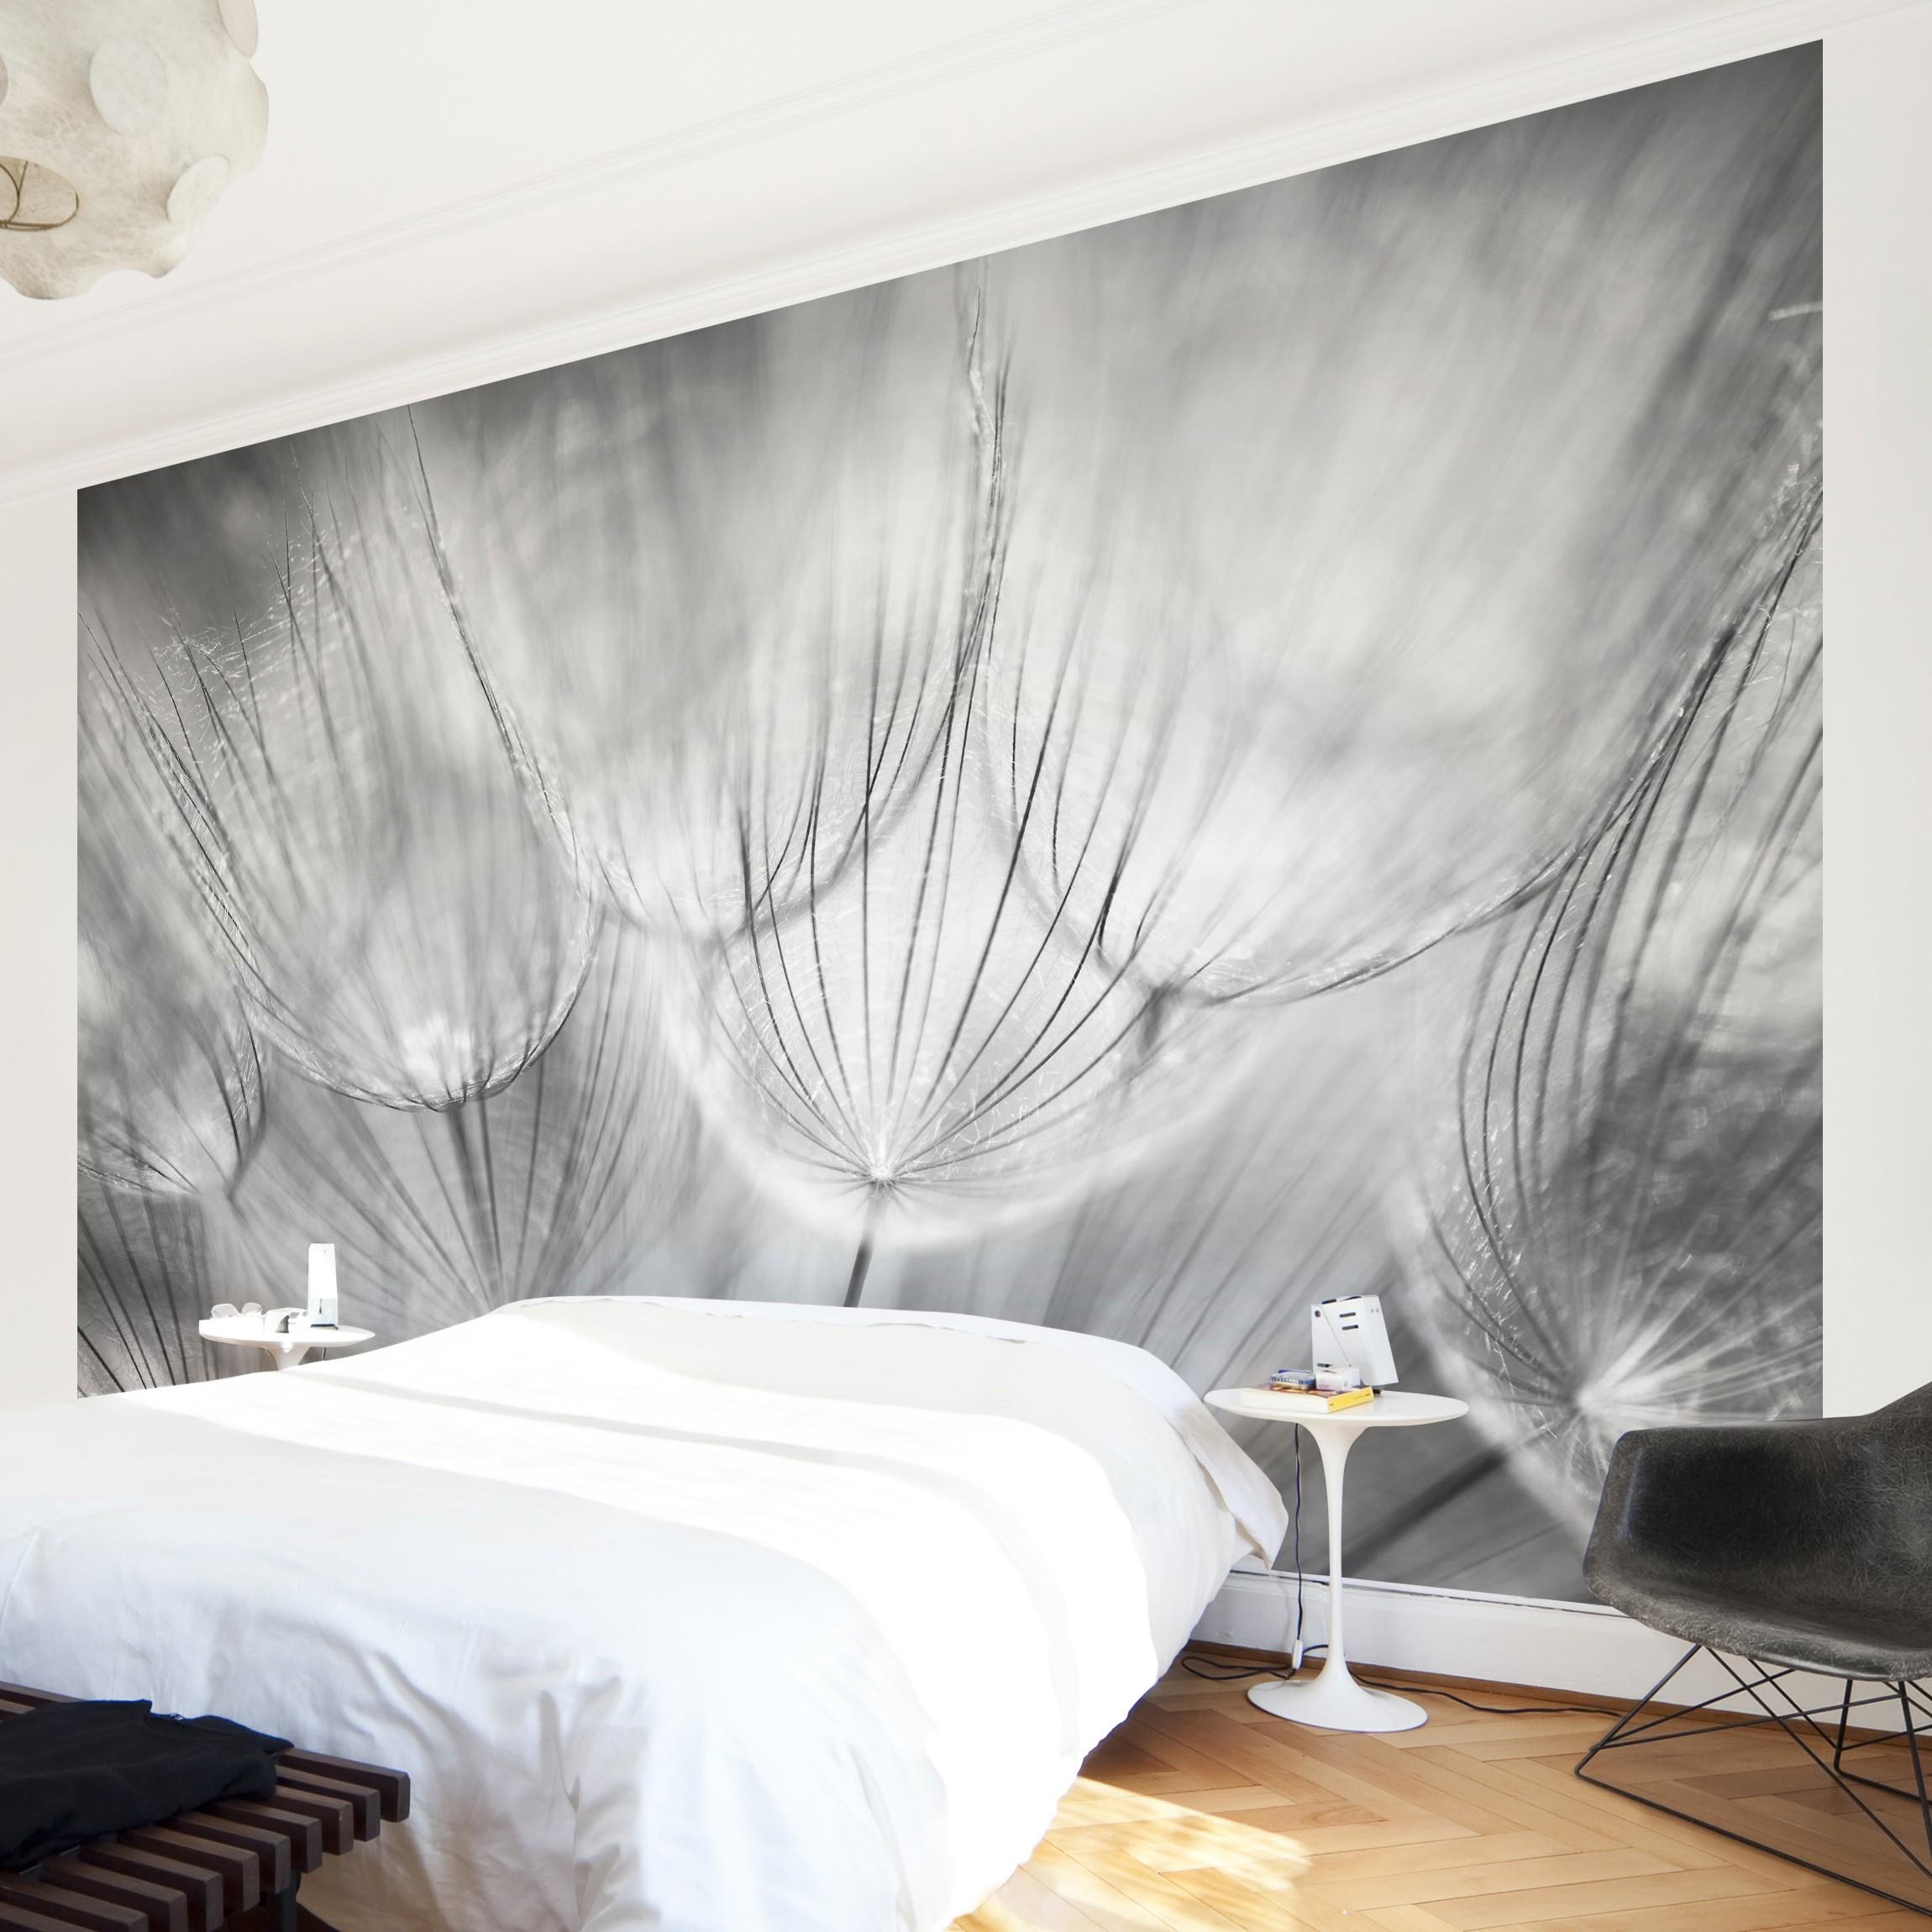 selbstklebende fototapete pusteblumen makroaufnahme in schwarz weiss. Black Bedroom Furniture Sets. Home Design Ideas